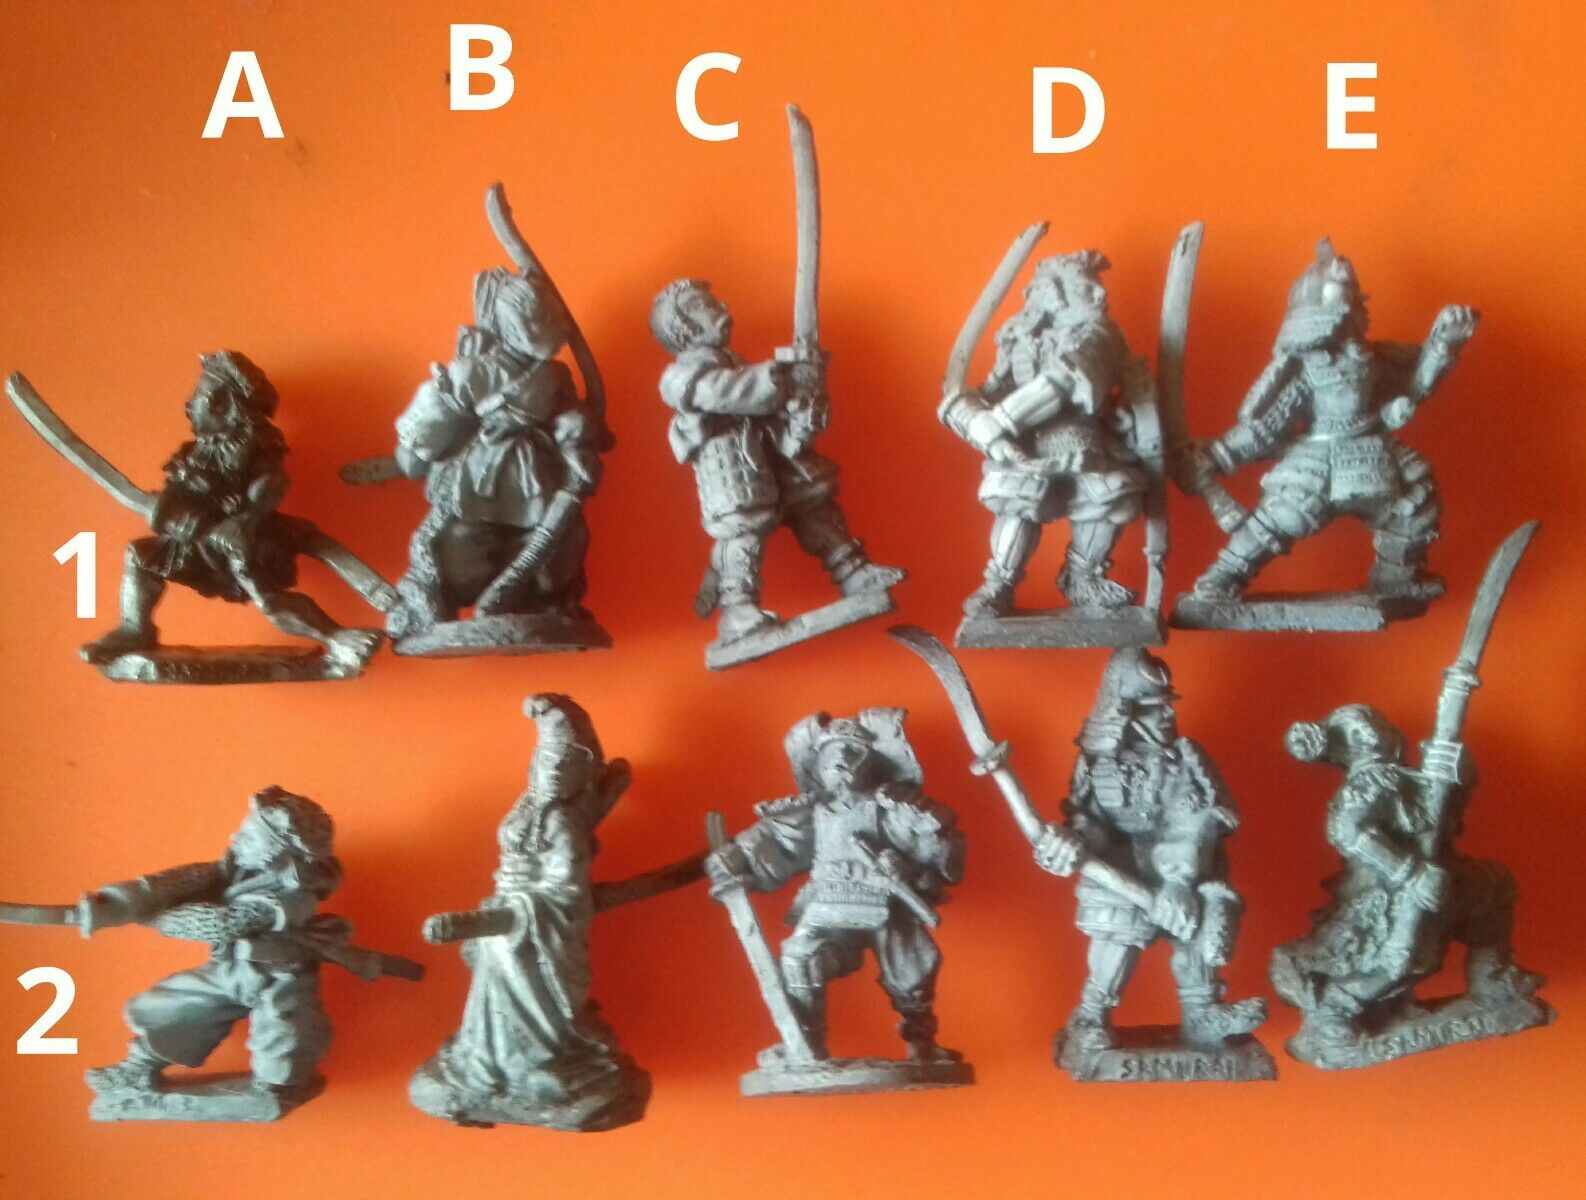 12x DL1 C05 Samurai Ronin oriental luchadores citadel GW Games Workshop pre-slotta